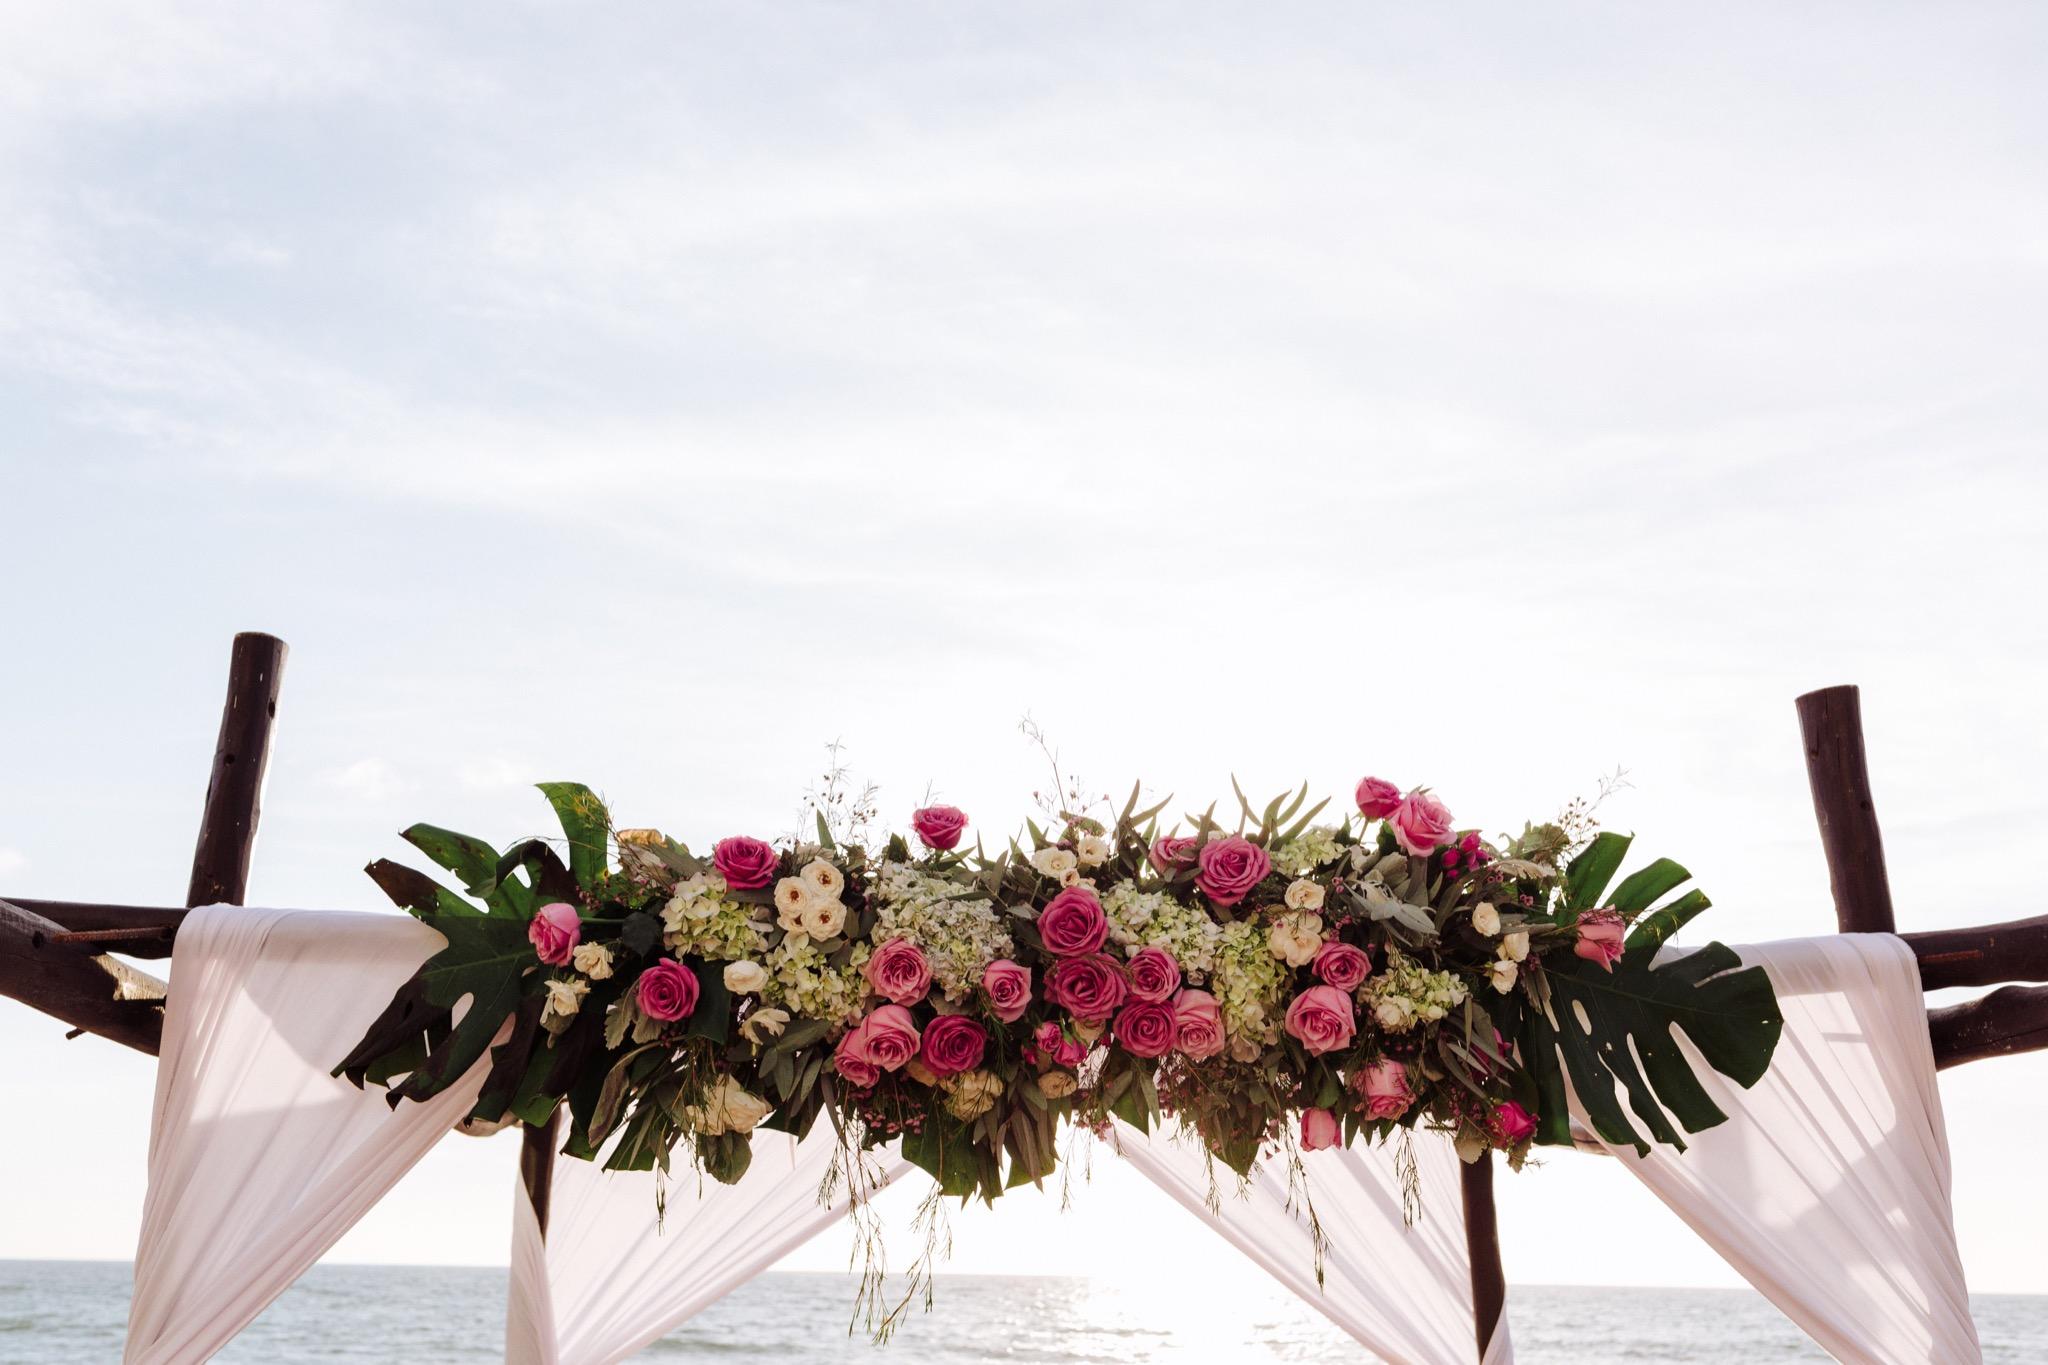 Javier_noriega_fotografo_bodas_profesional_zacatecas_mexico_mazatlan_sinaloa_photographer_weddings41